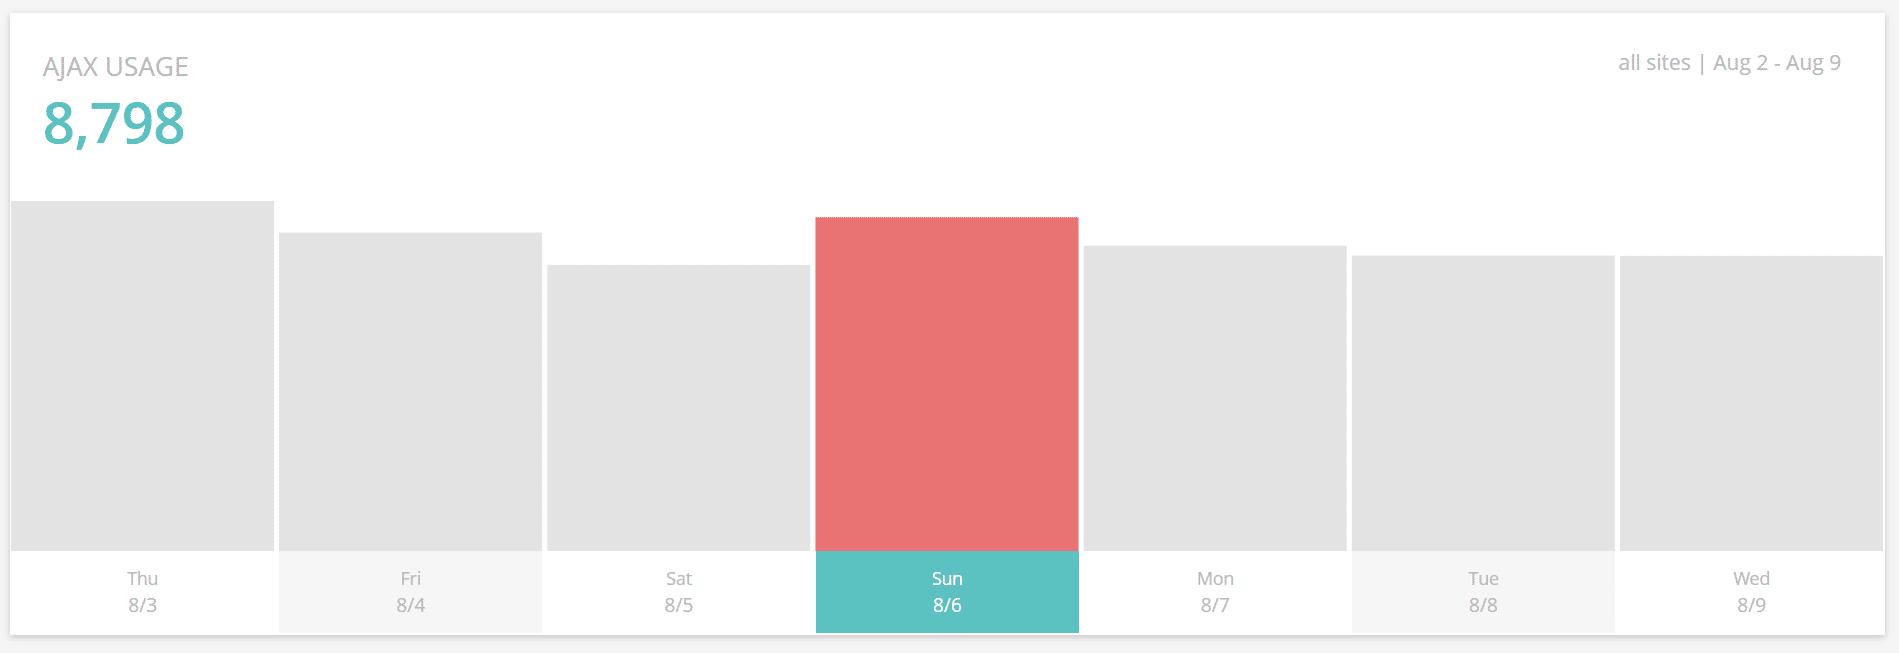 Performance Monitoring - AJAX usage